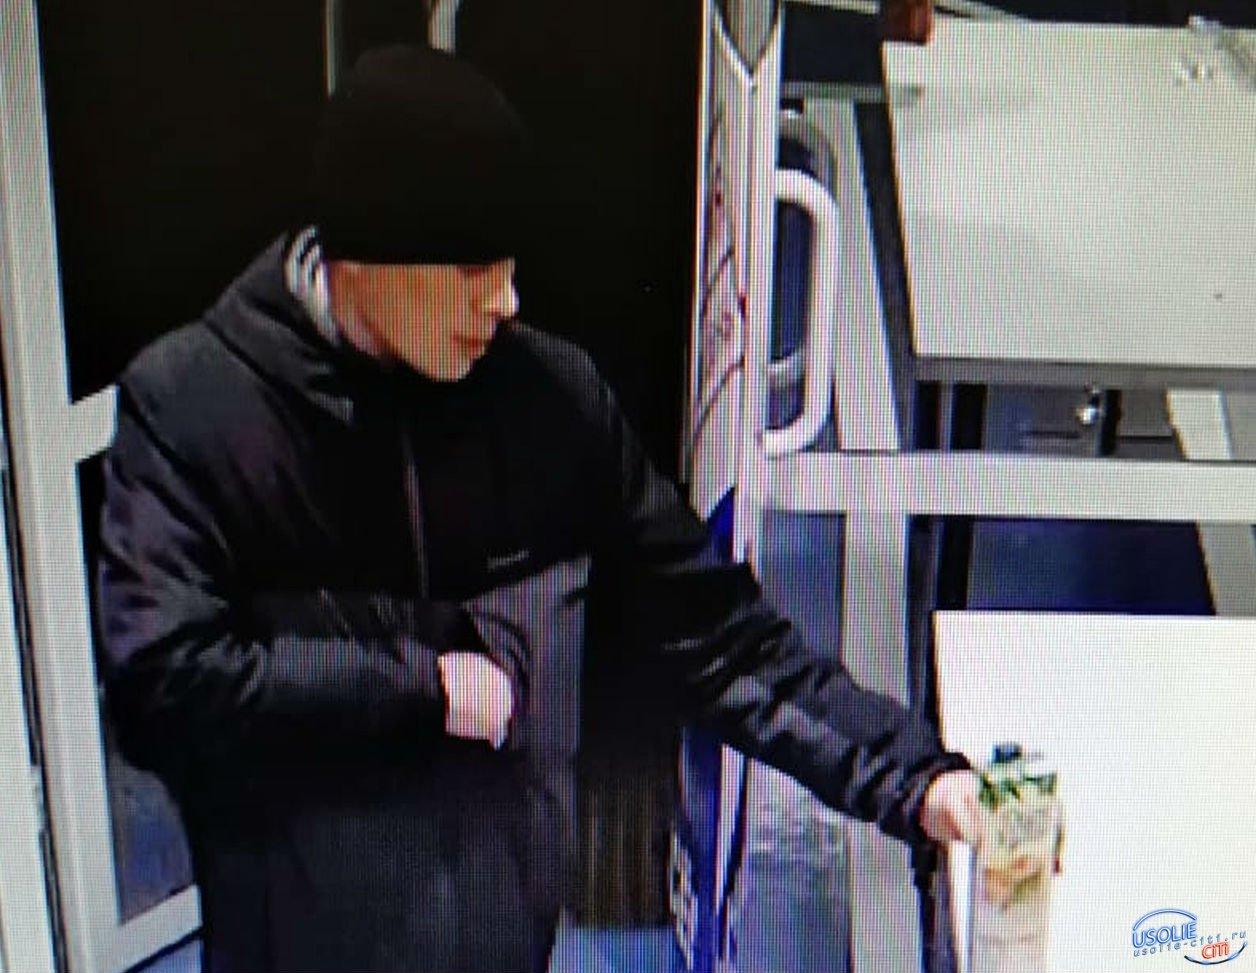 Усольчанин украл товар из магазина